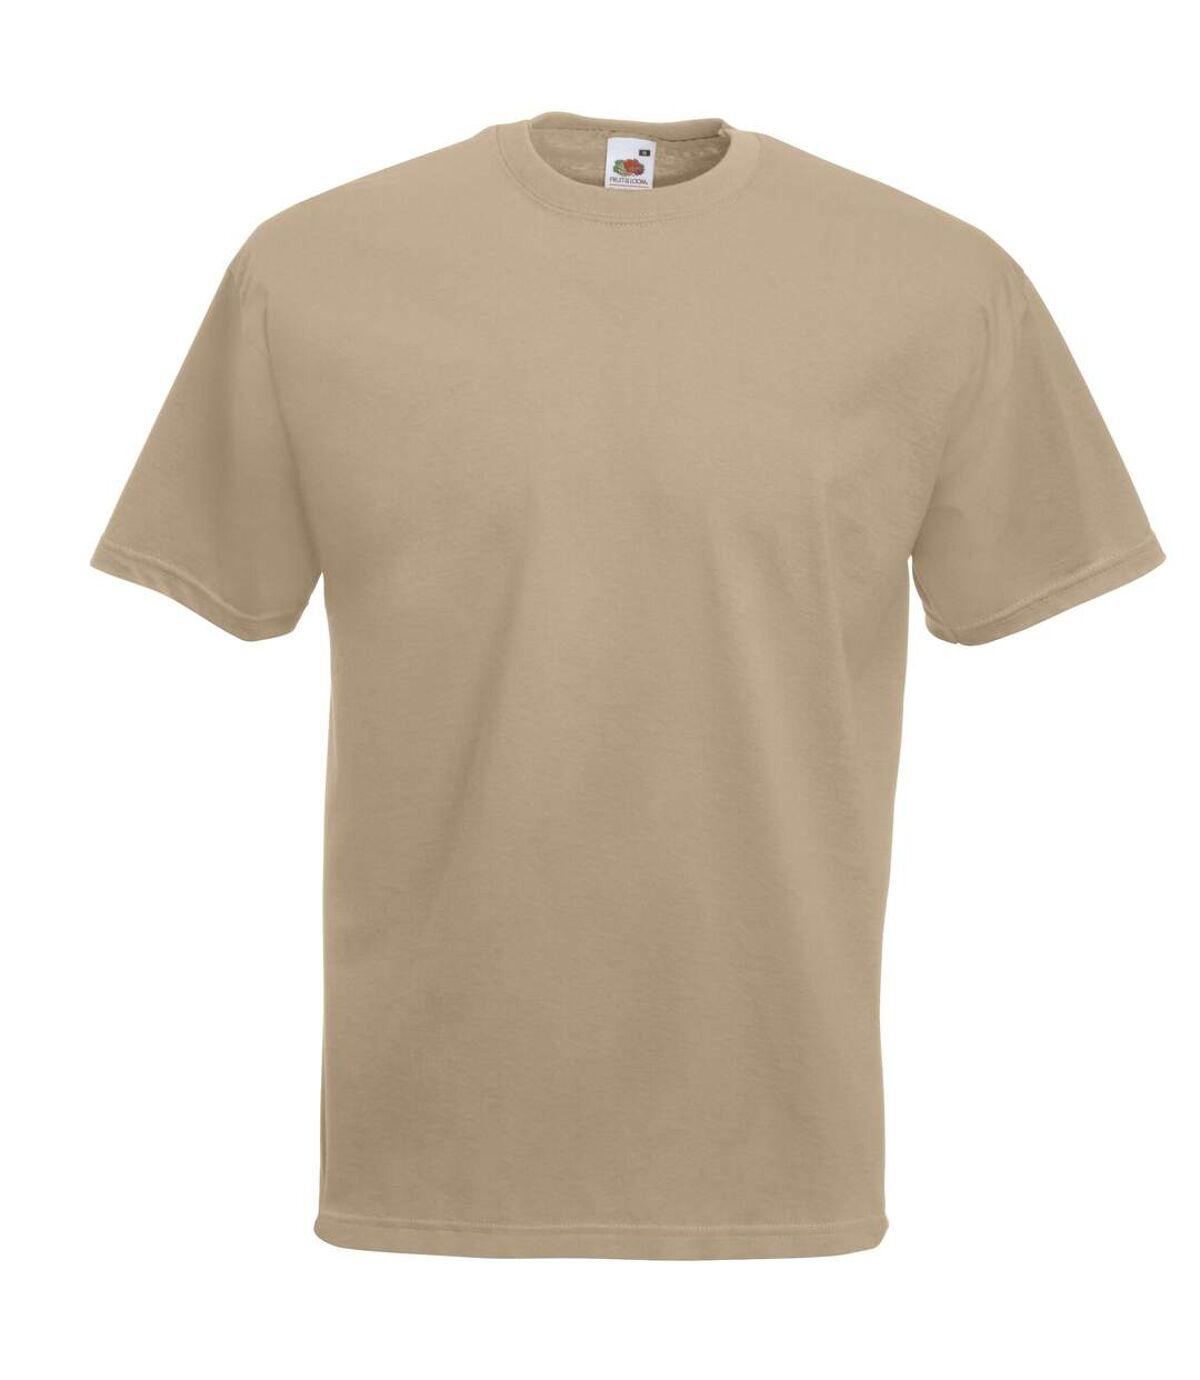 Fruit Of The Loom Mens Valueweight Short Sleeve T-Shirt (Black) - UTBC330